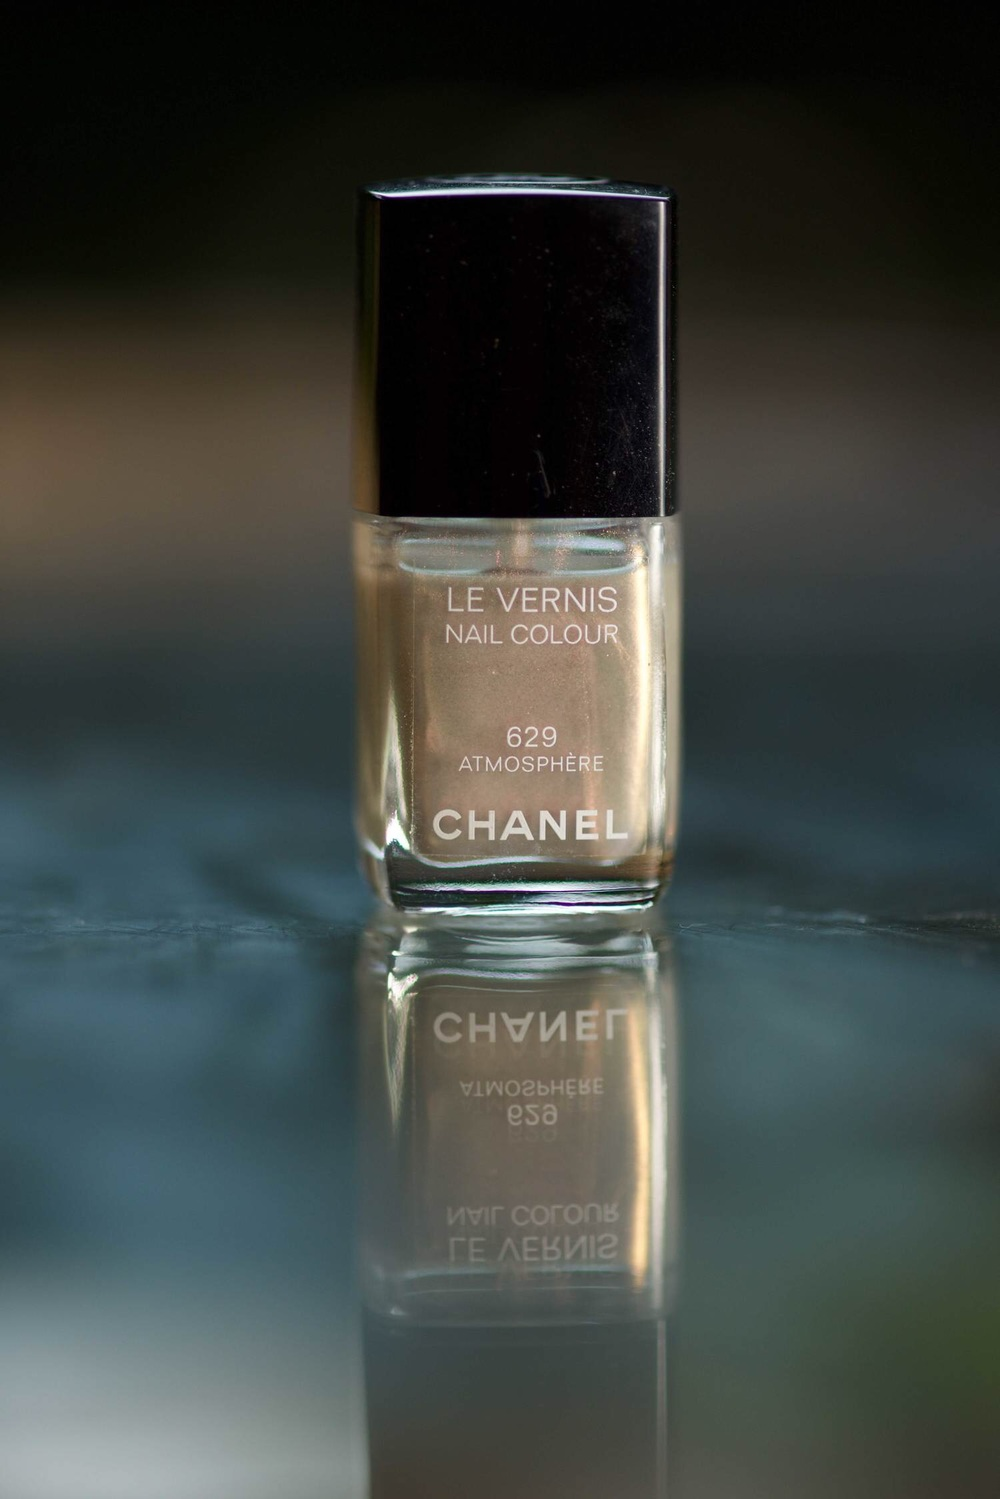 Chanel Le Vernis Nail Paint, image copyright gunjanirk